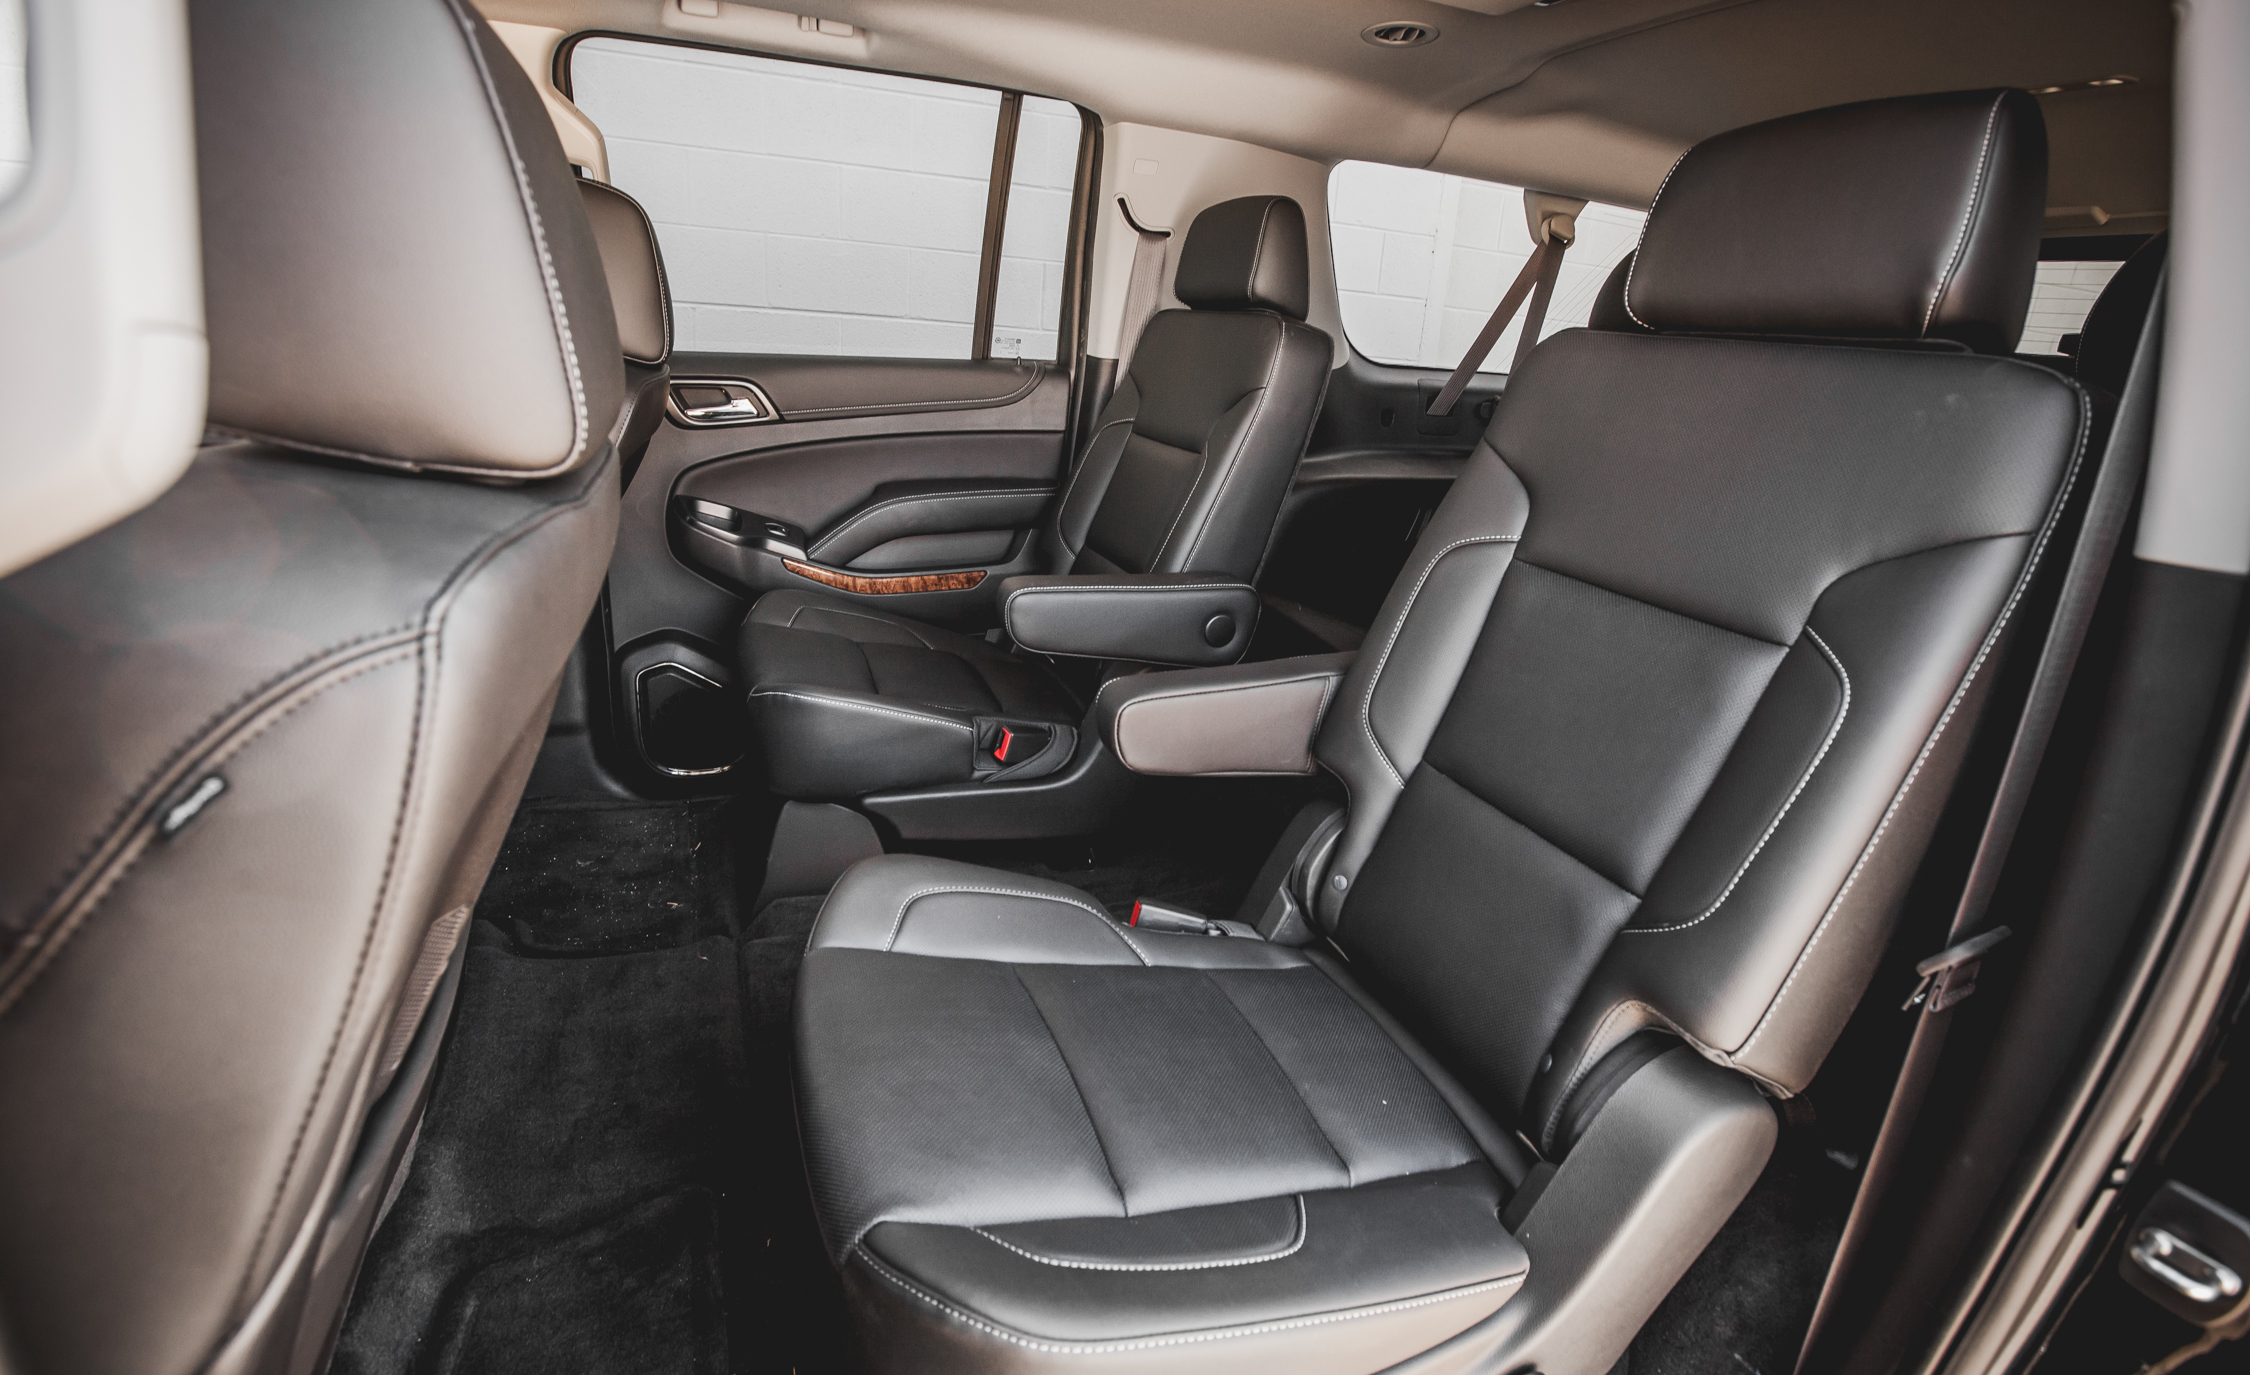 2015 Chevrolet Suburban LTZ Interior 2nd Row Passenger Seats